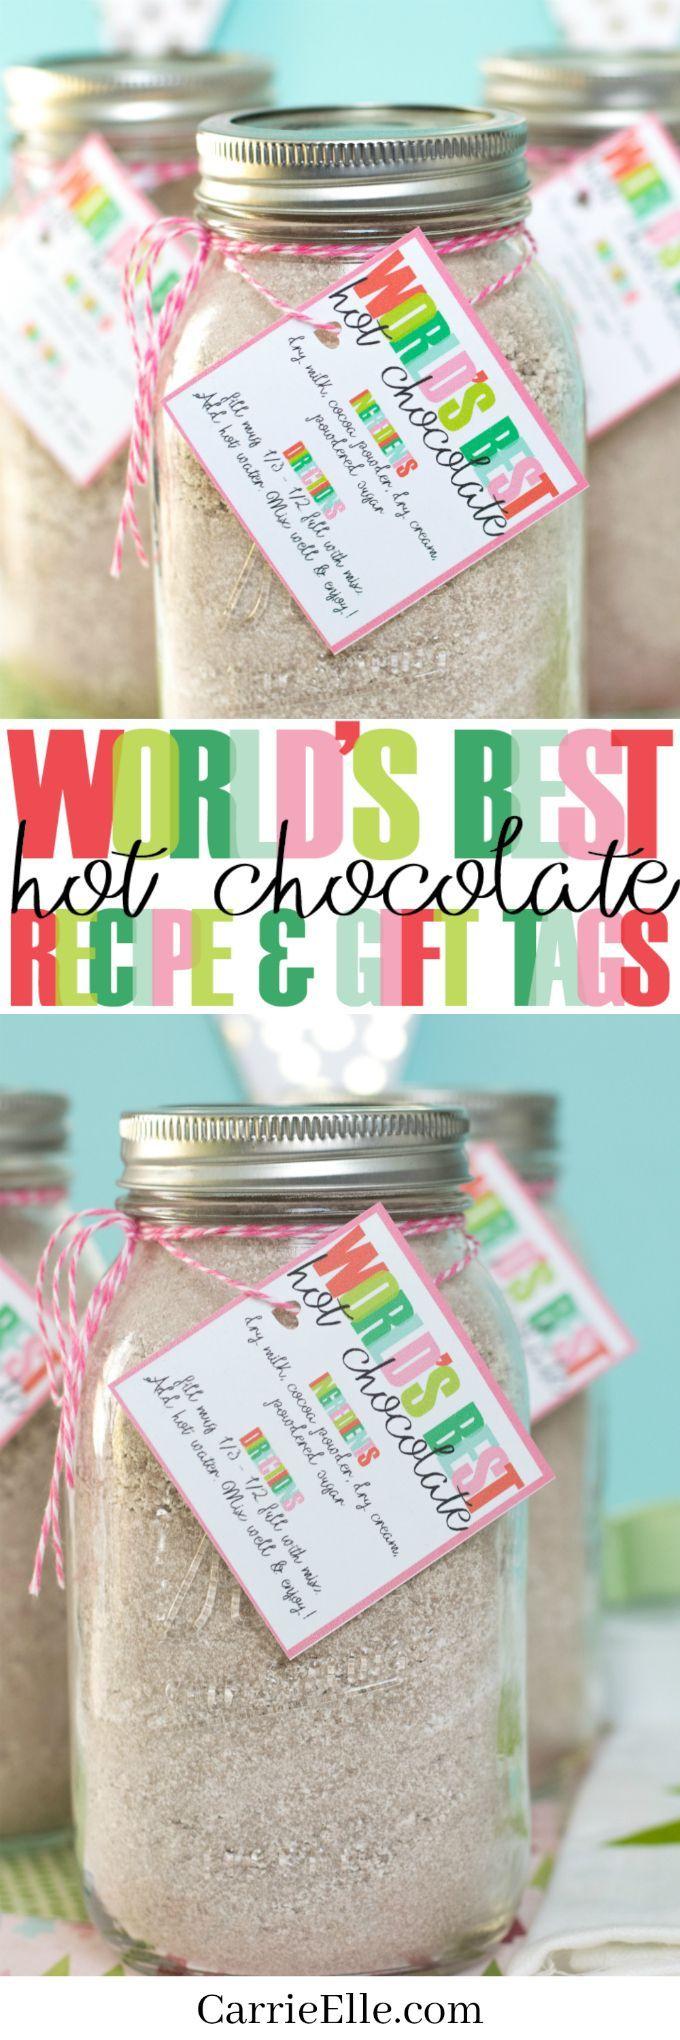 Worldus best hot chocolate recipe u printable gift tags perfect